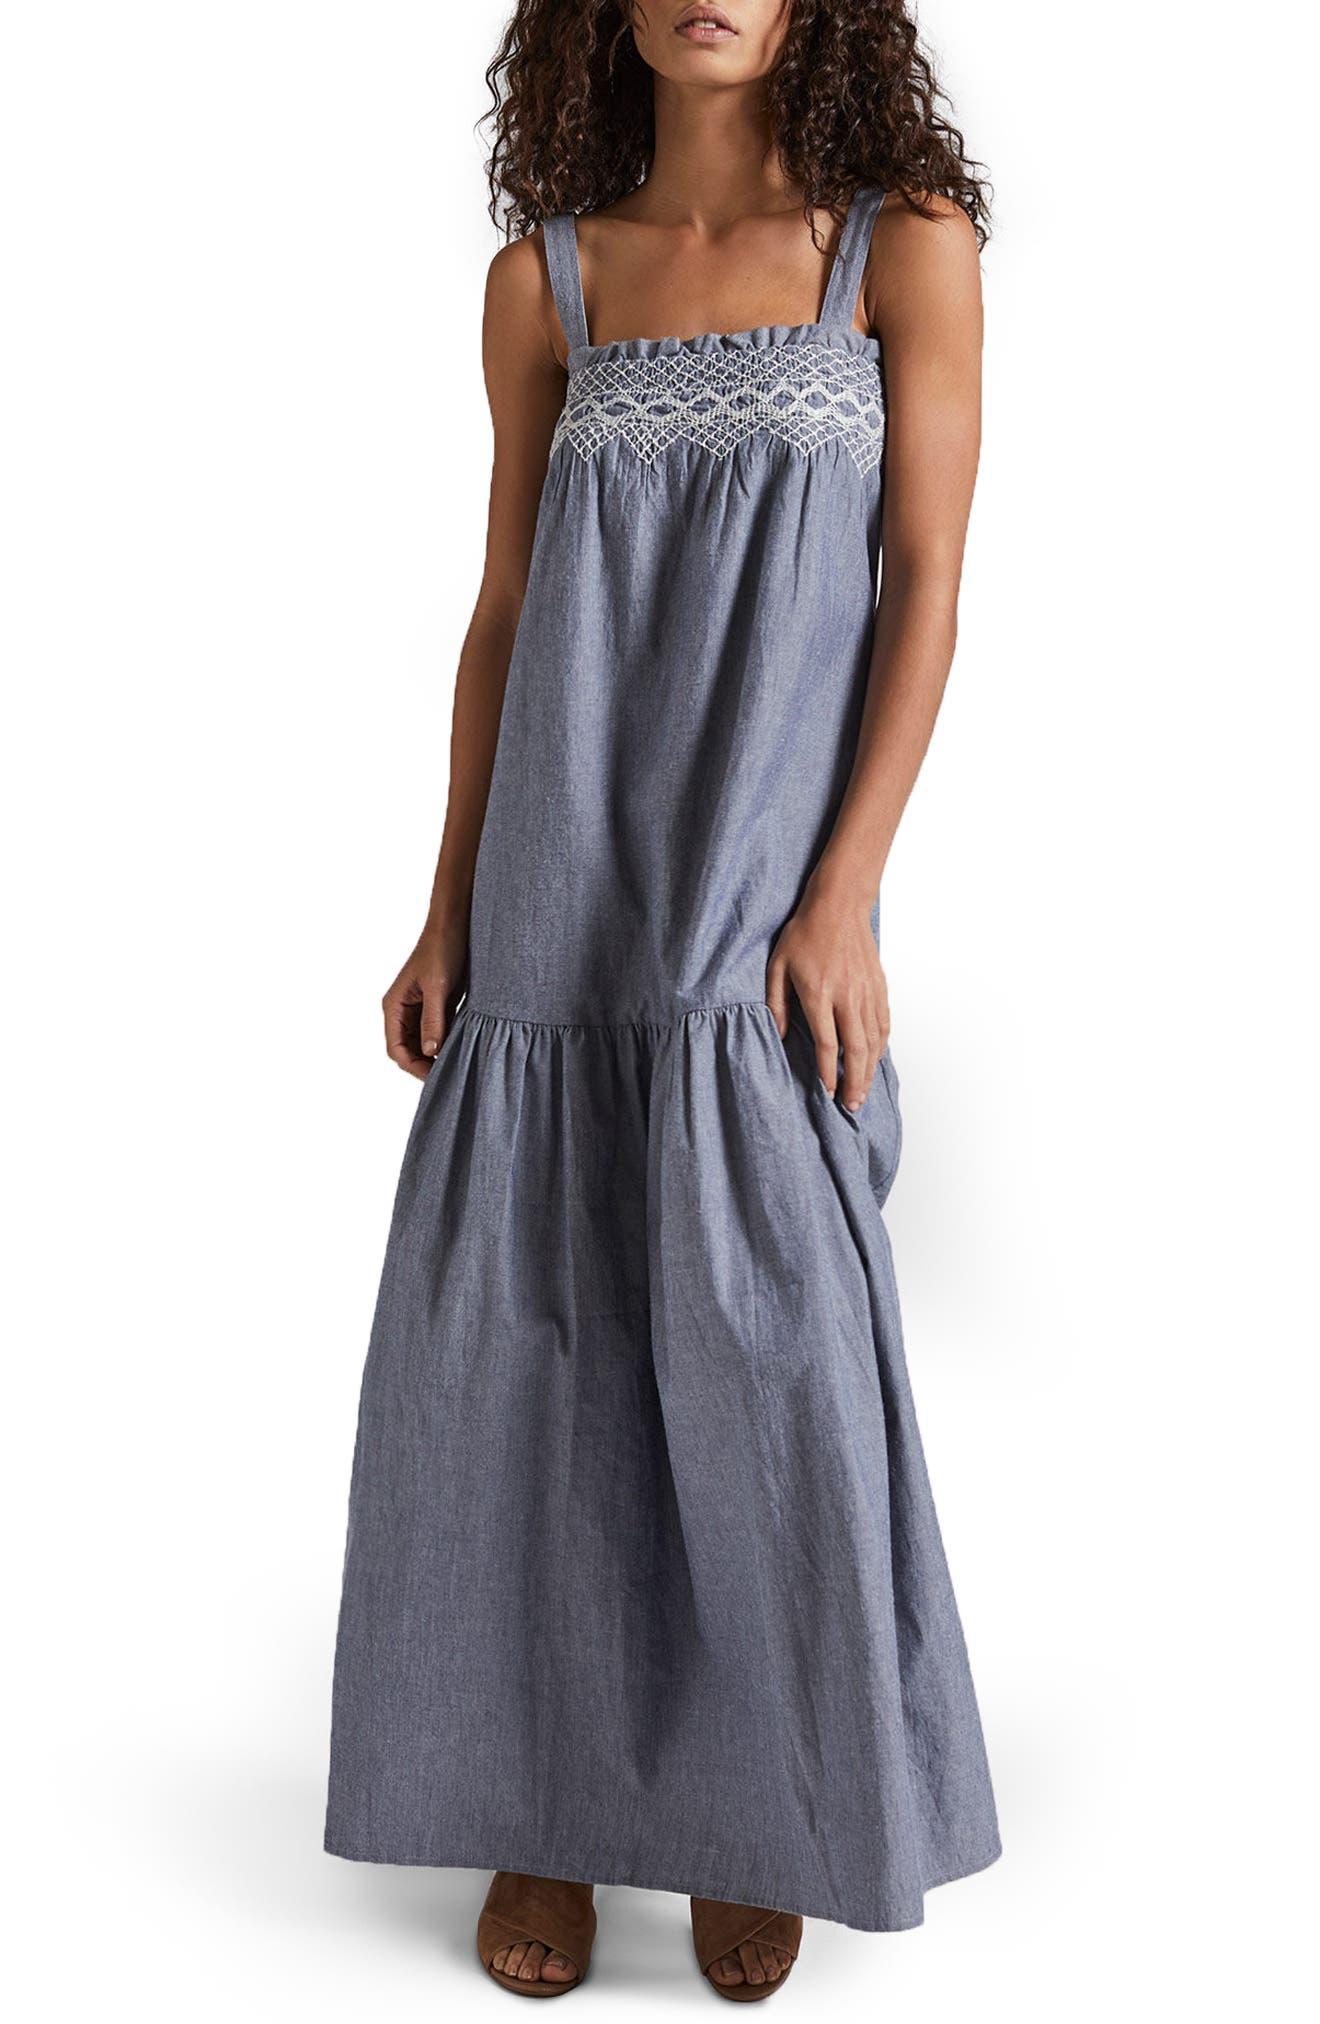 Current/Elliott The Rancher Chambray Maxi Dress